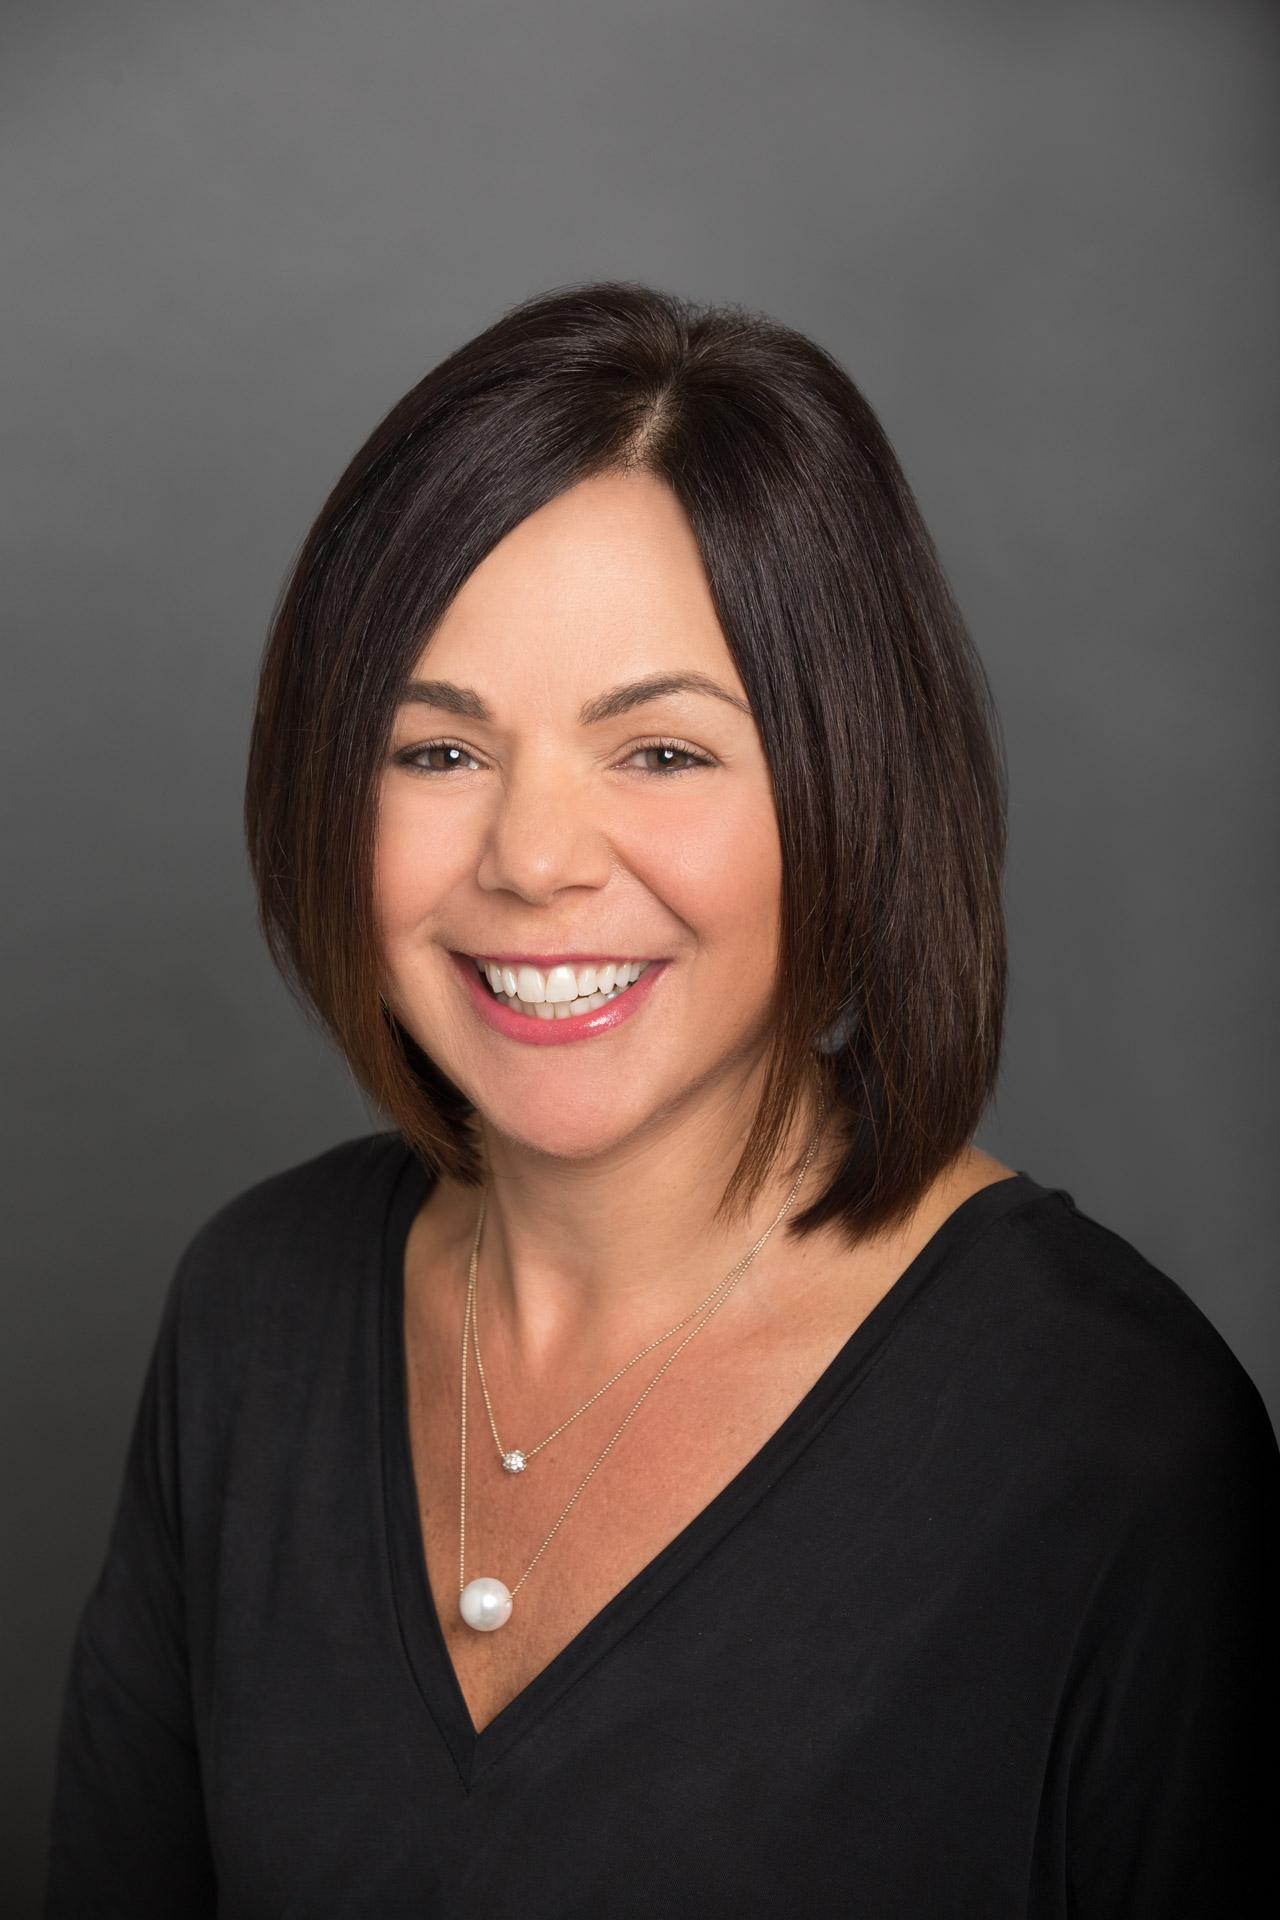 Dana Parker